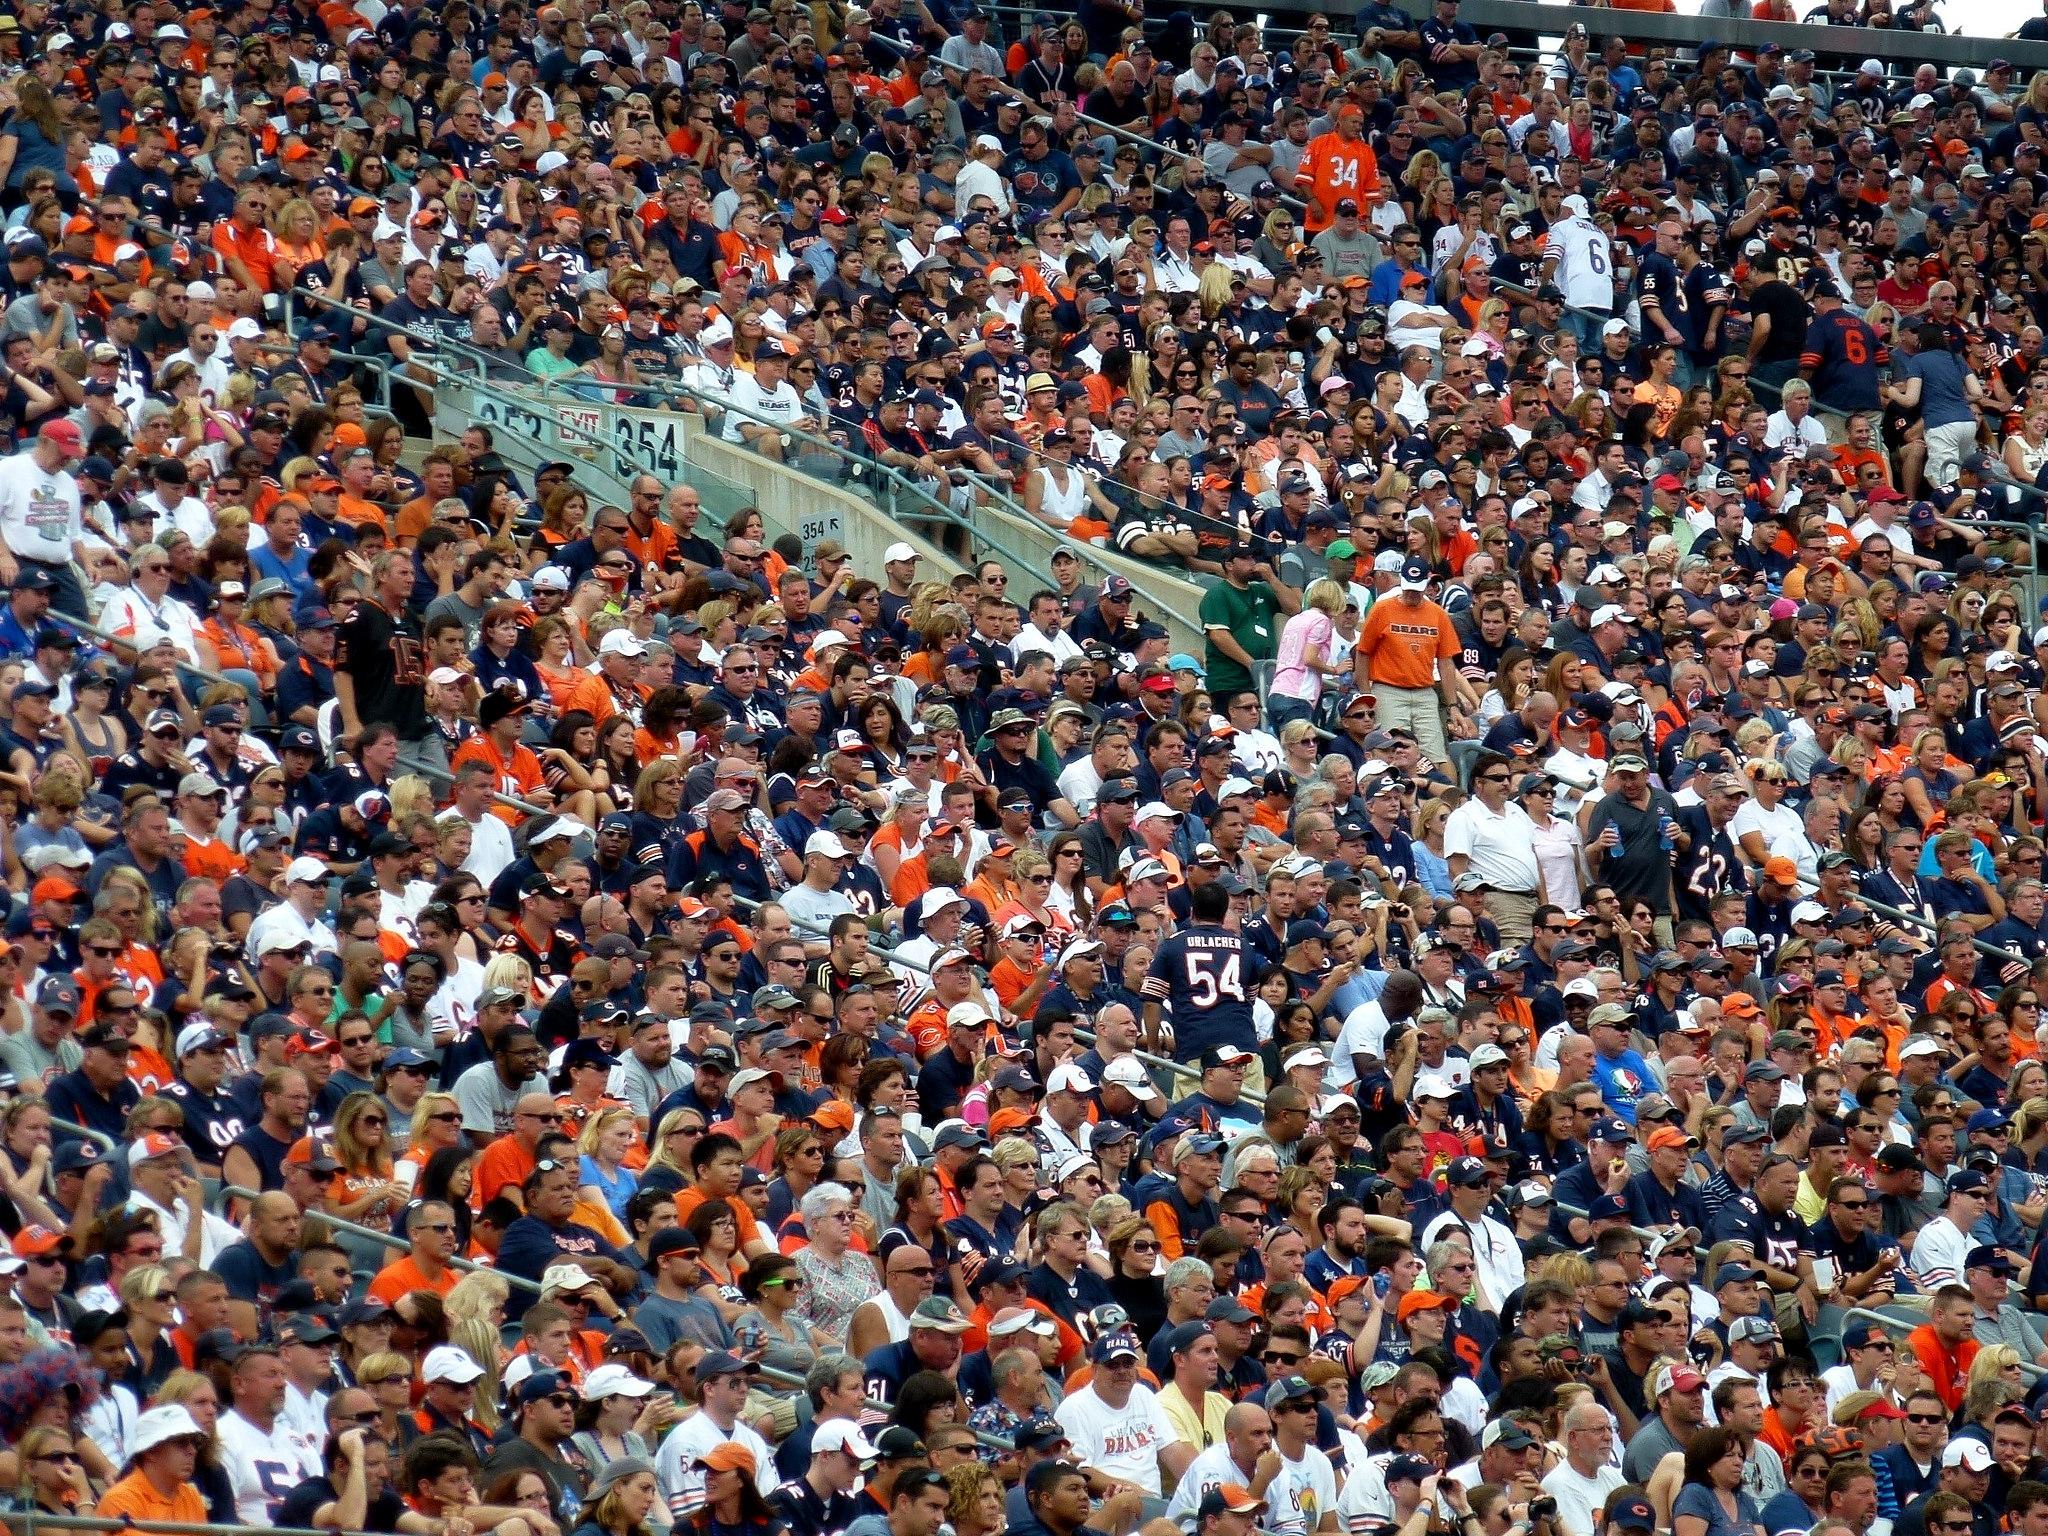 fans cheering at Cincinnati Bengals vs Chicago Bears game